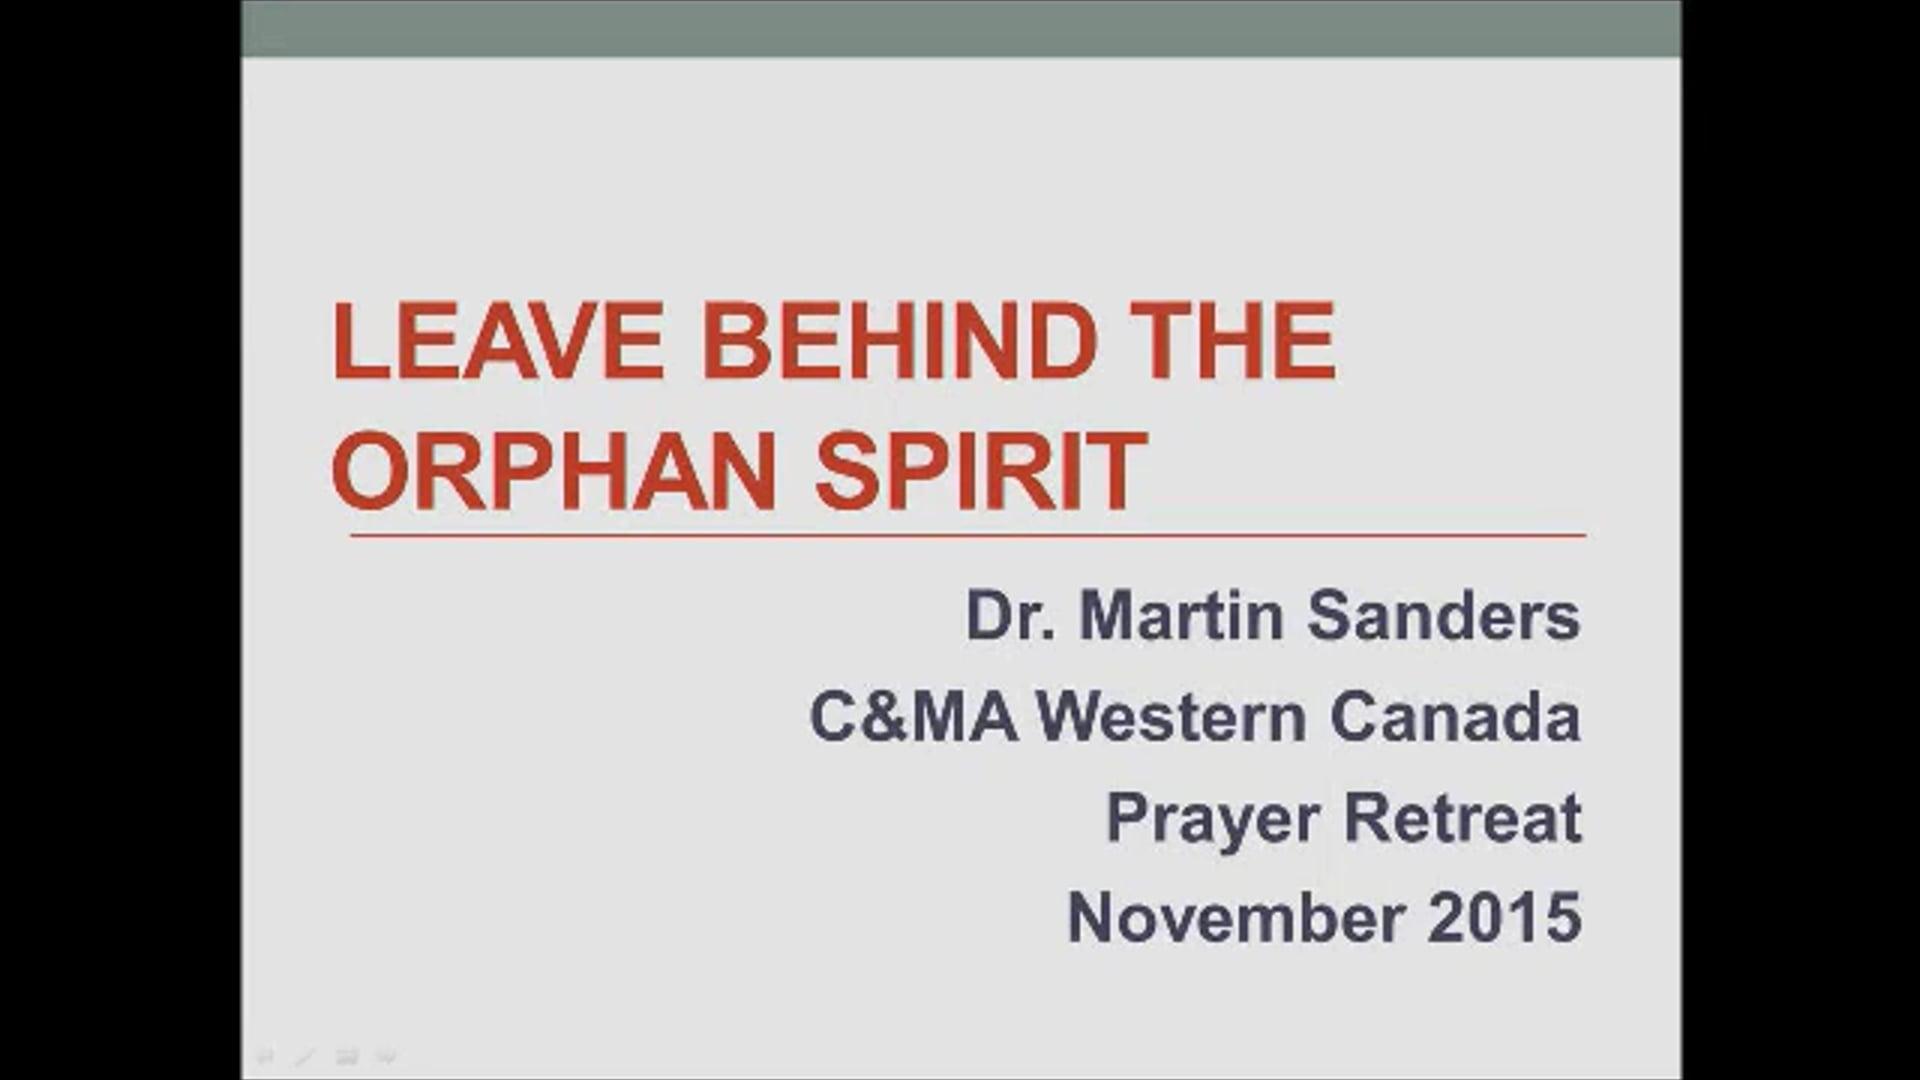 Martin Sanders - Leave Behind the Orphan Spirit